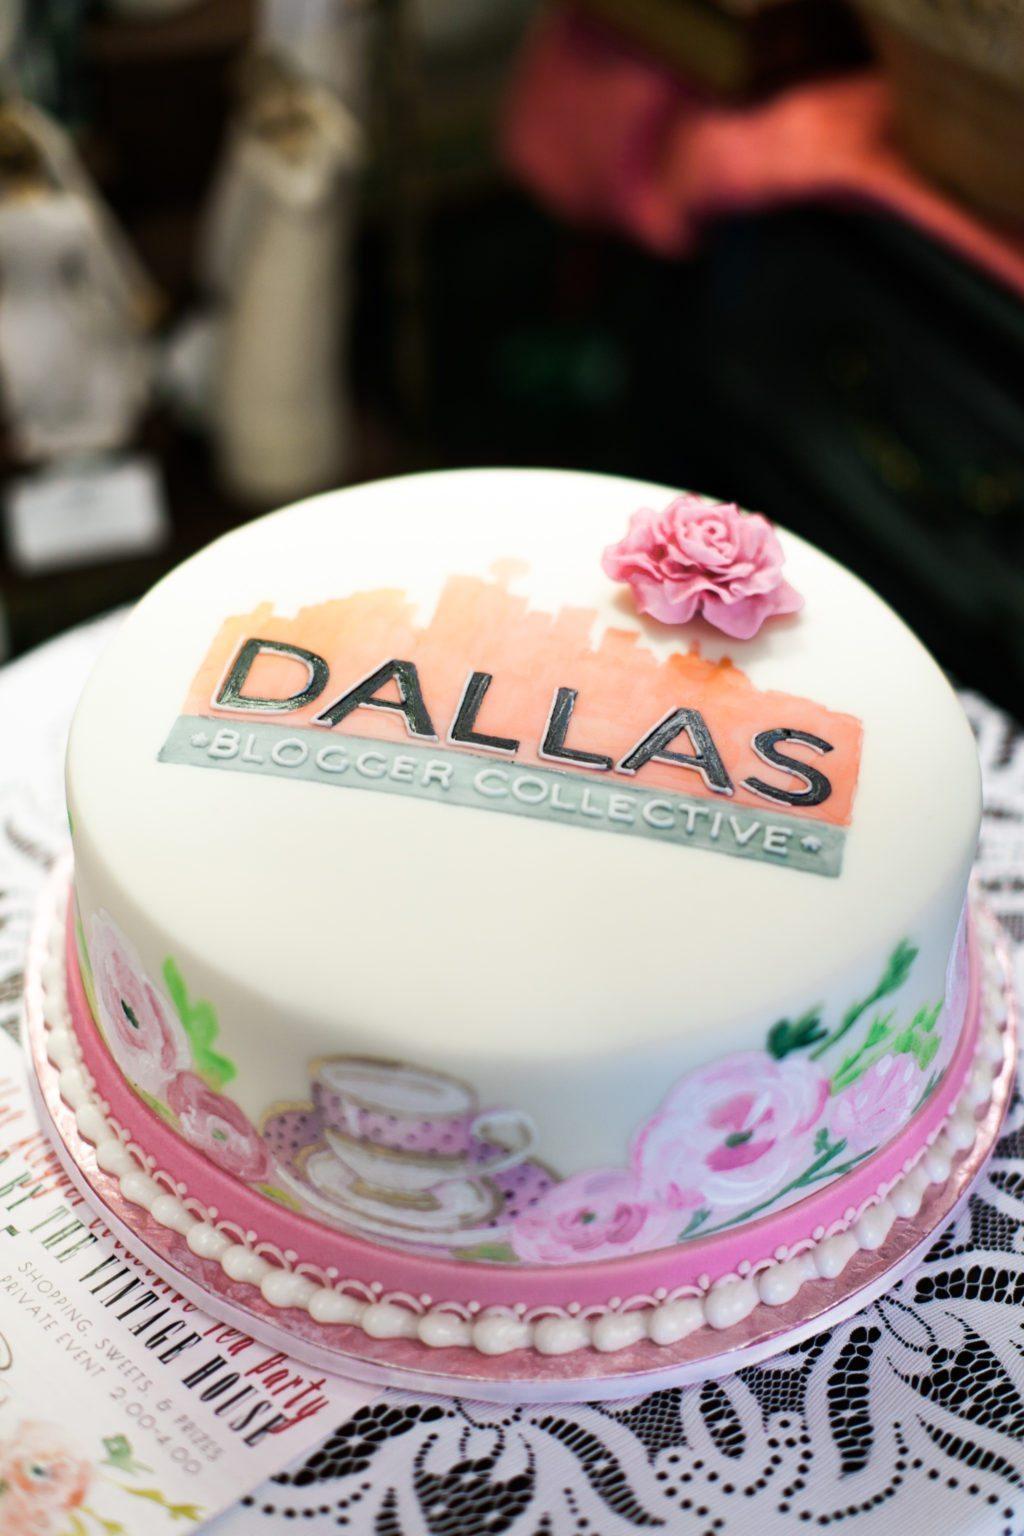 dallas-blogger-collective-the-vintage-house-3523